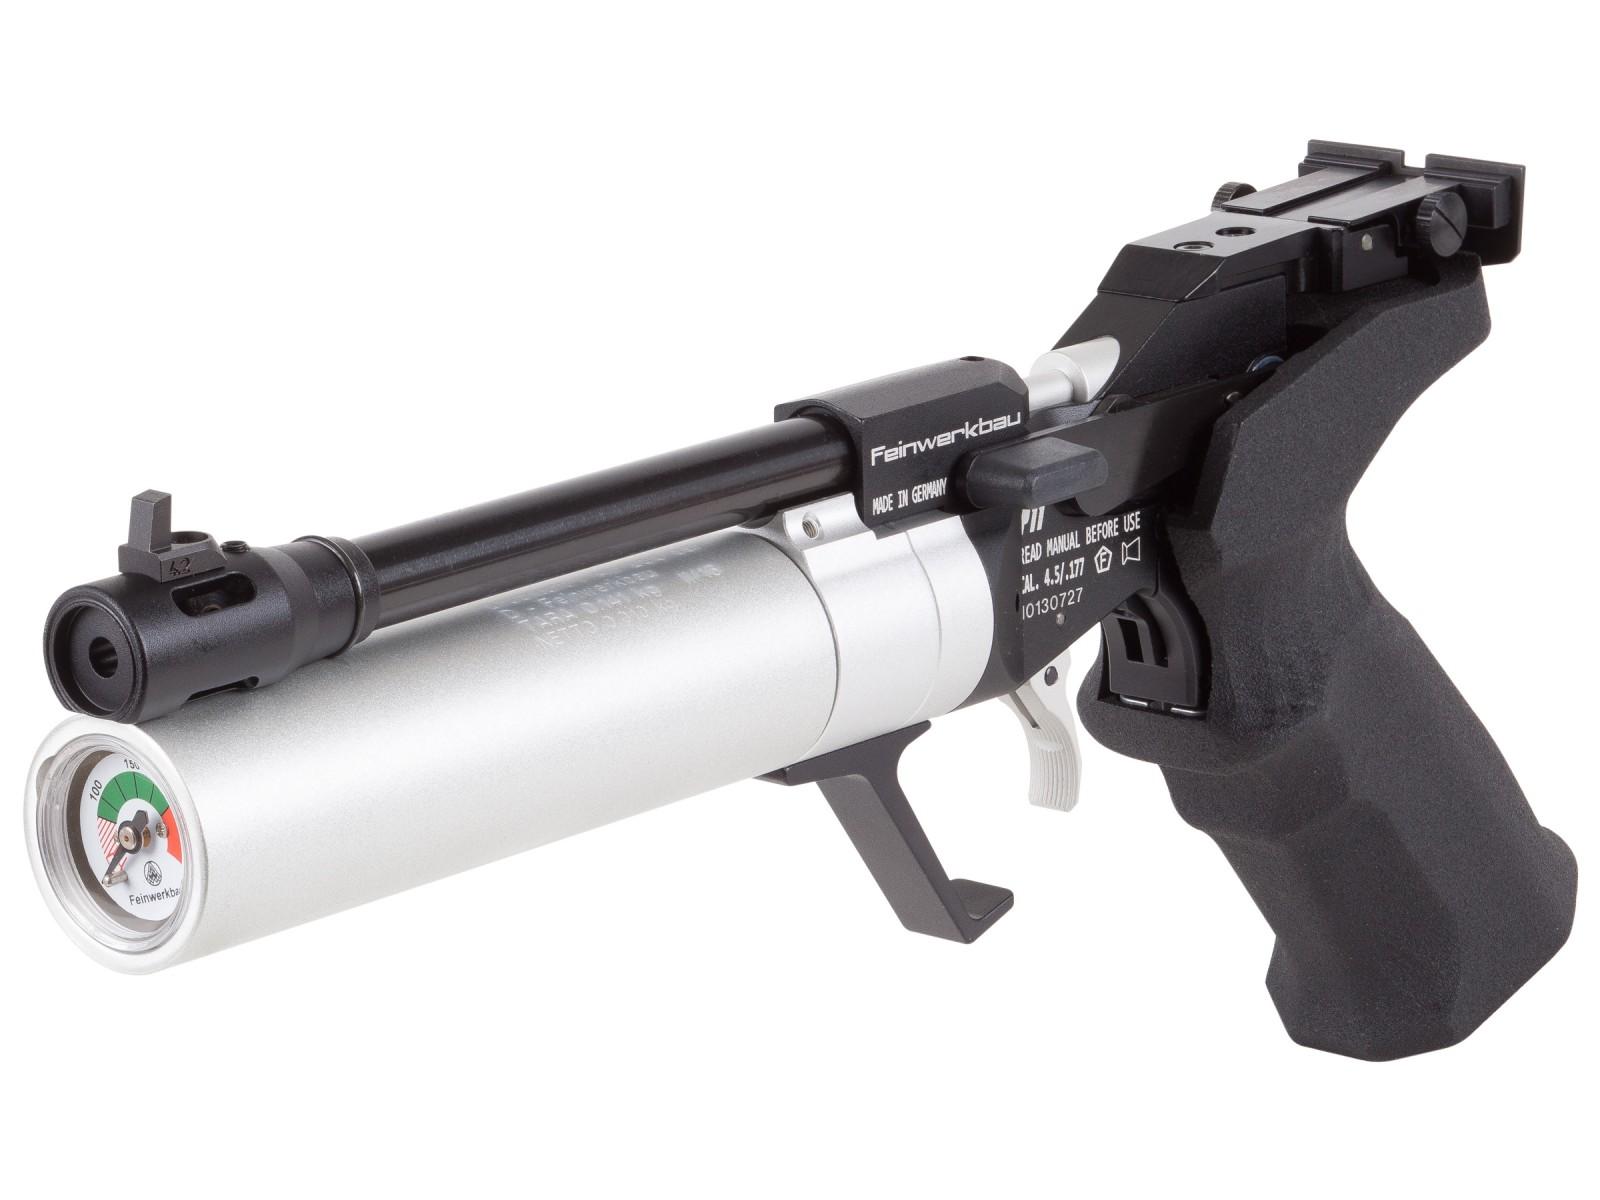 Feinwerkbau P11 Piccolo Air Pistol